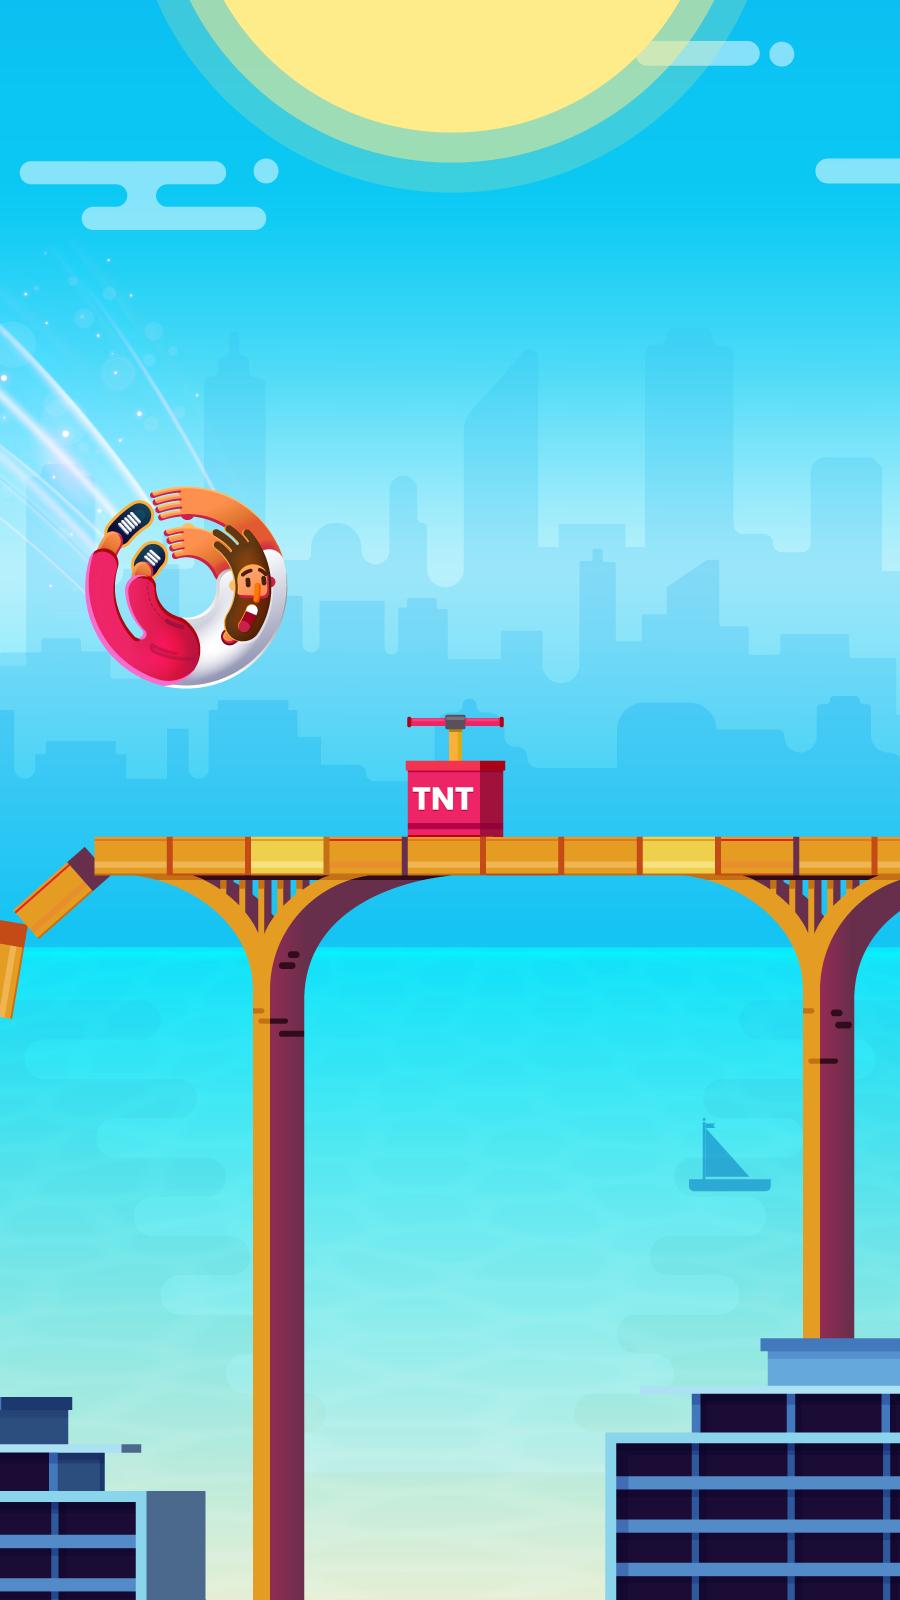 BounceDot_Gameplay_v3.png